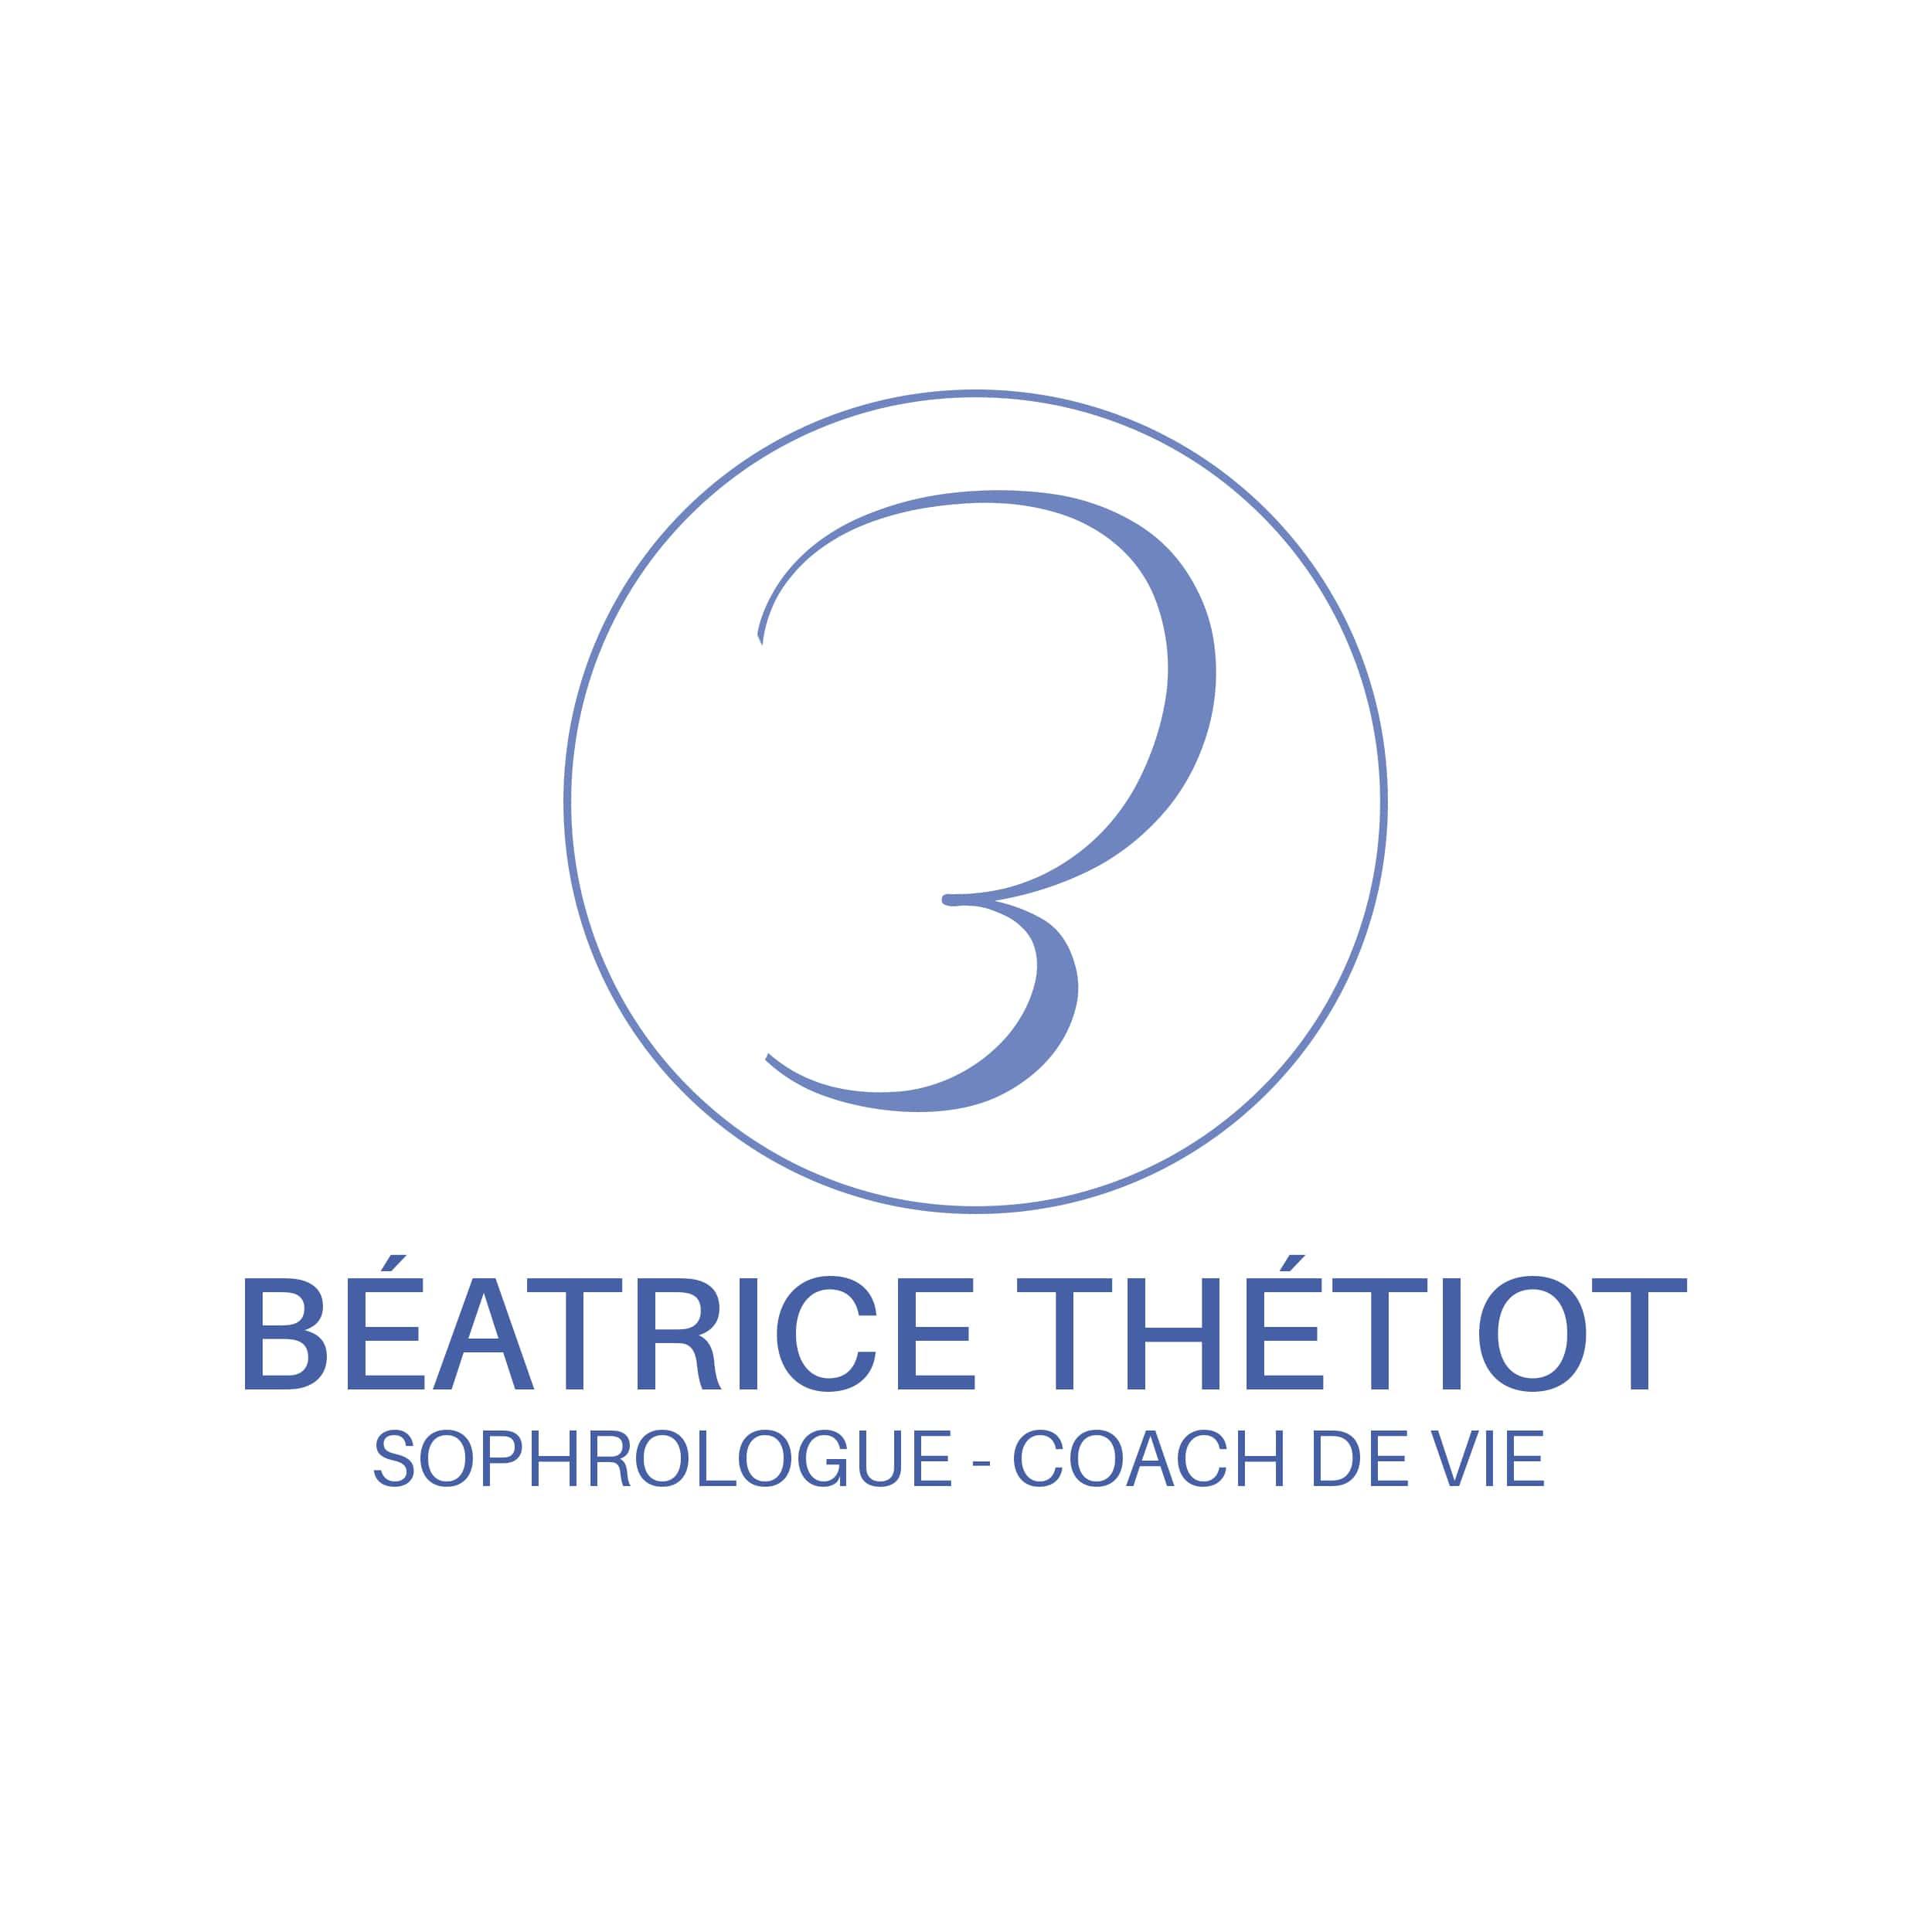 Code de déontologie Sophrologie Béatrice Thétiot